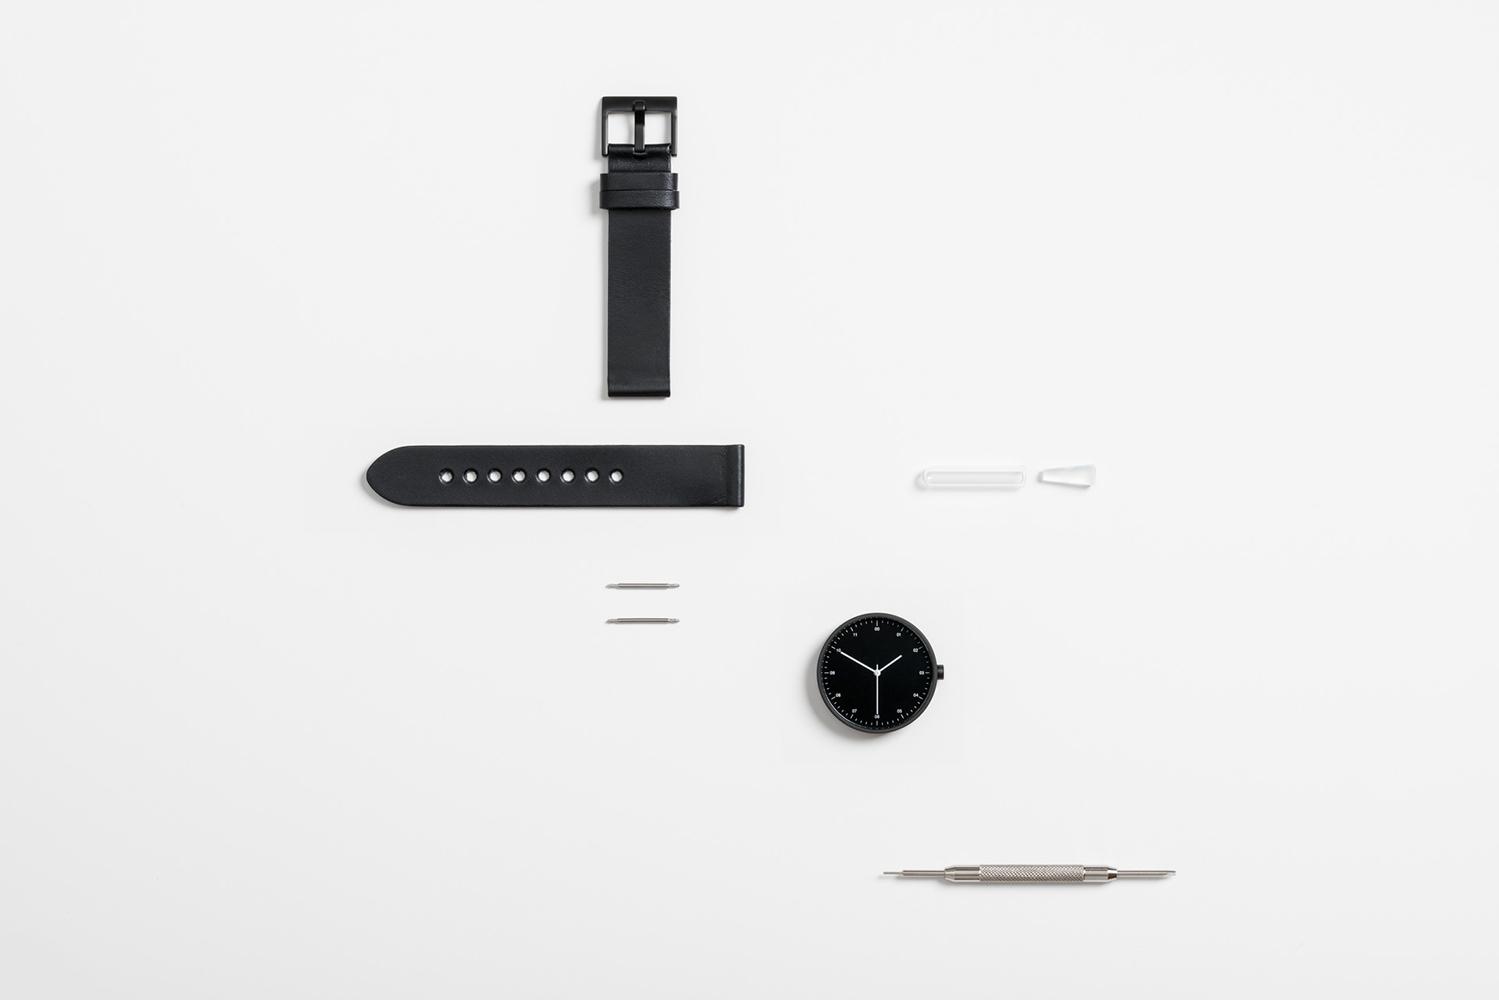 Design - minimalist | ello